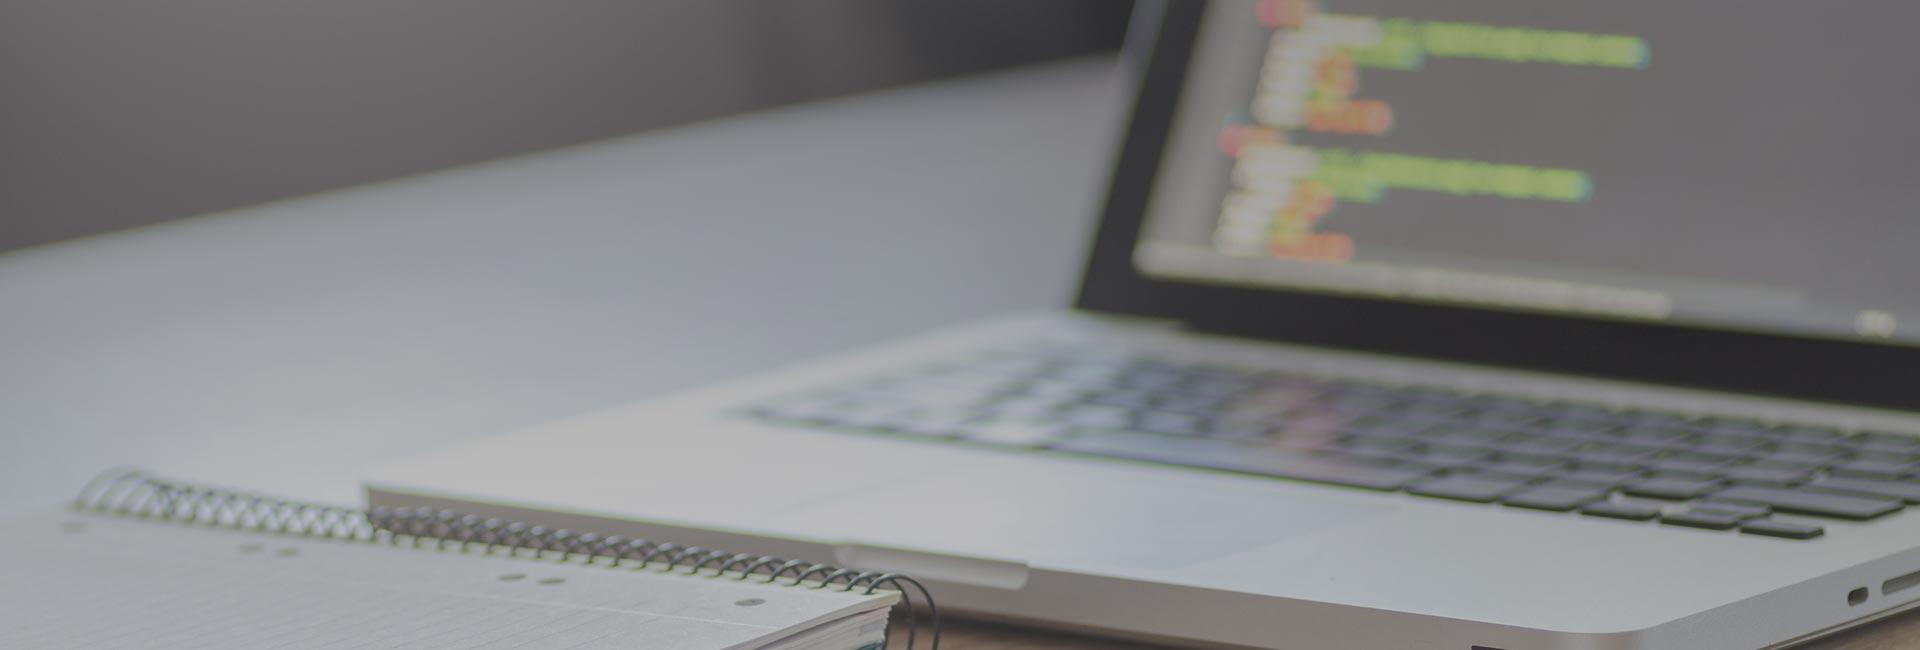 Agentie Web Design. Agentie marketing online. Agentie social media